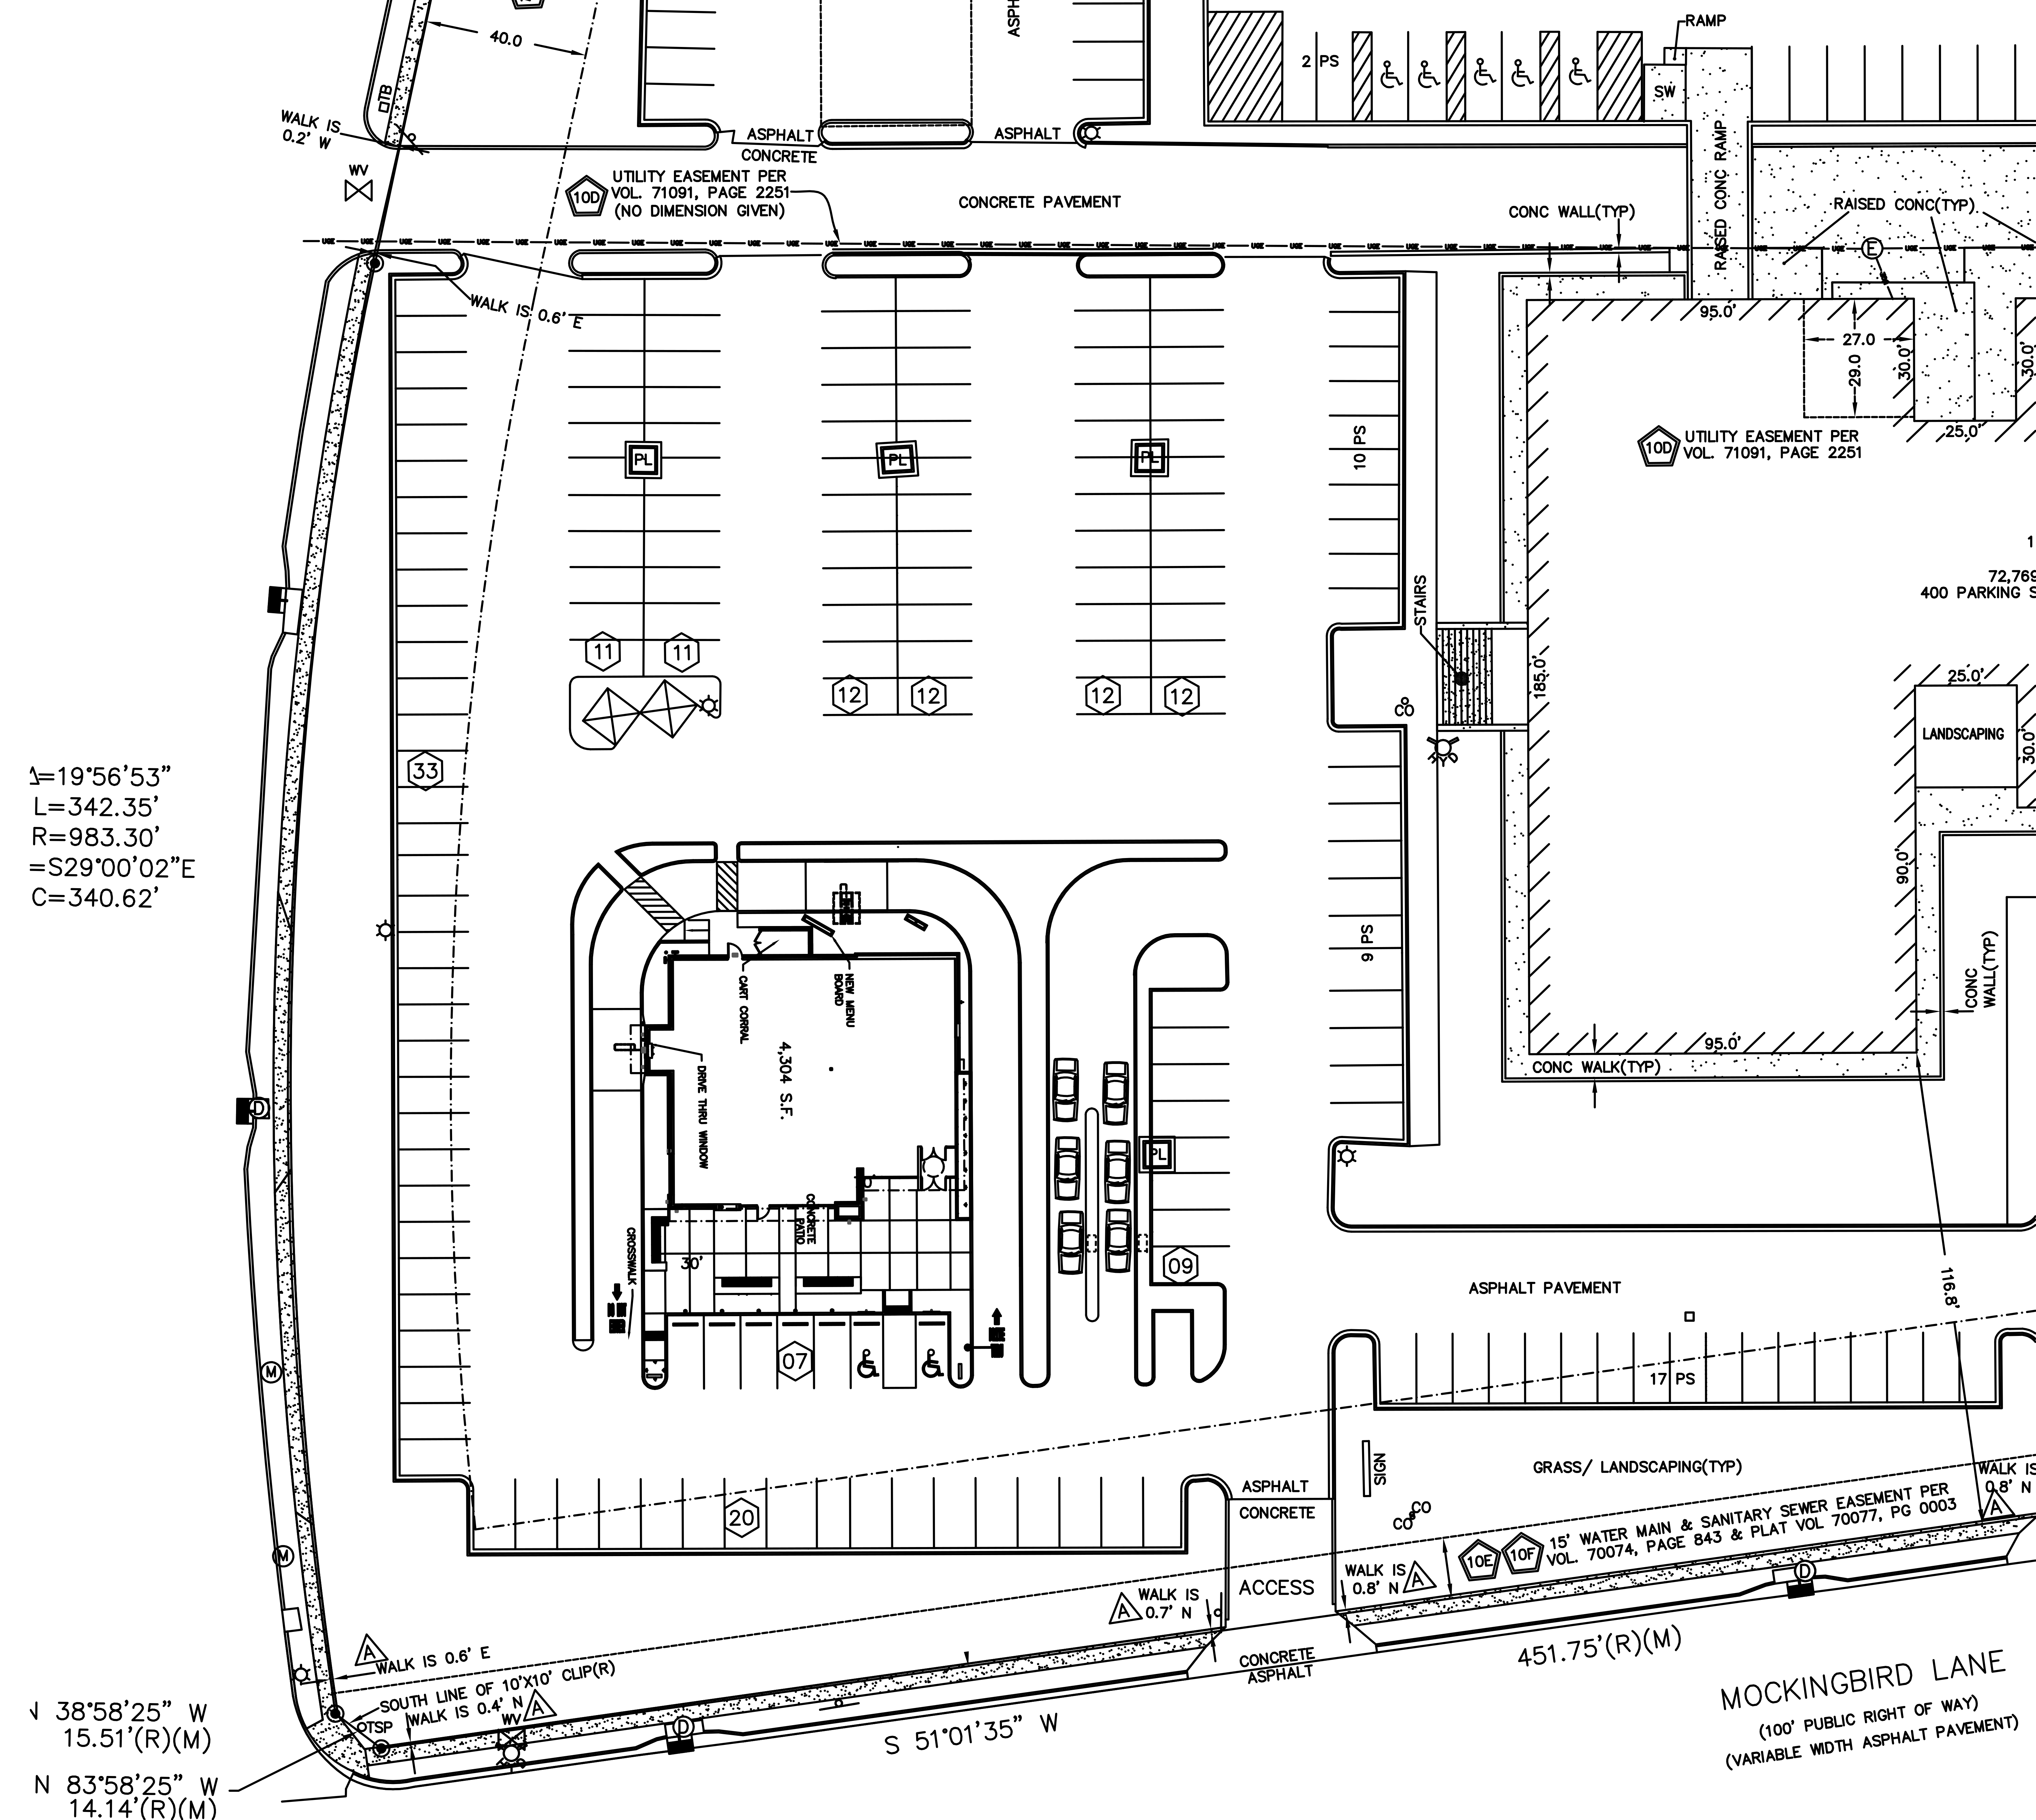 1341 W Mockingbird Ln - W Mockingbird Ln Pad Site: site plan